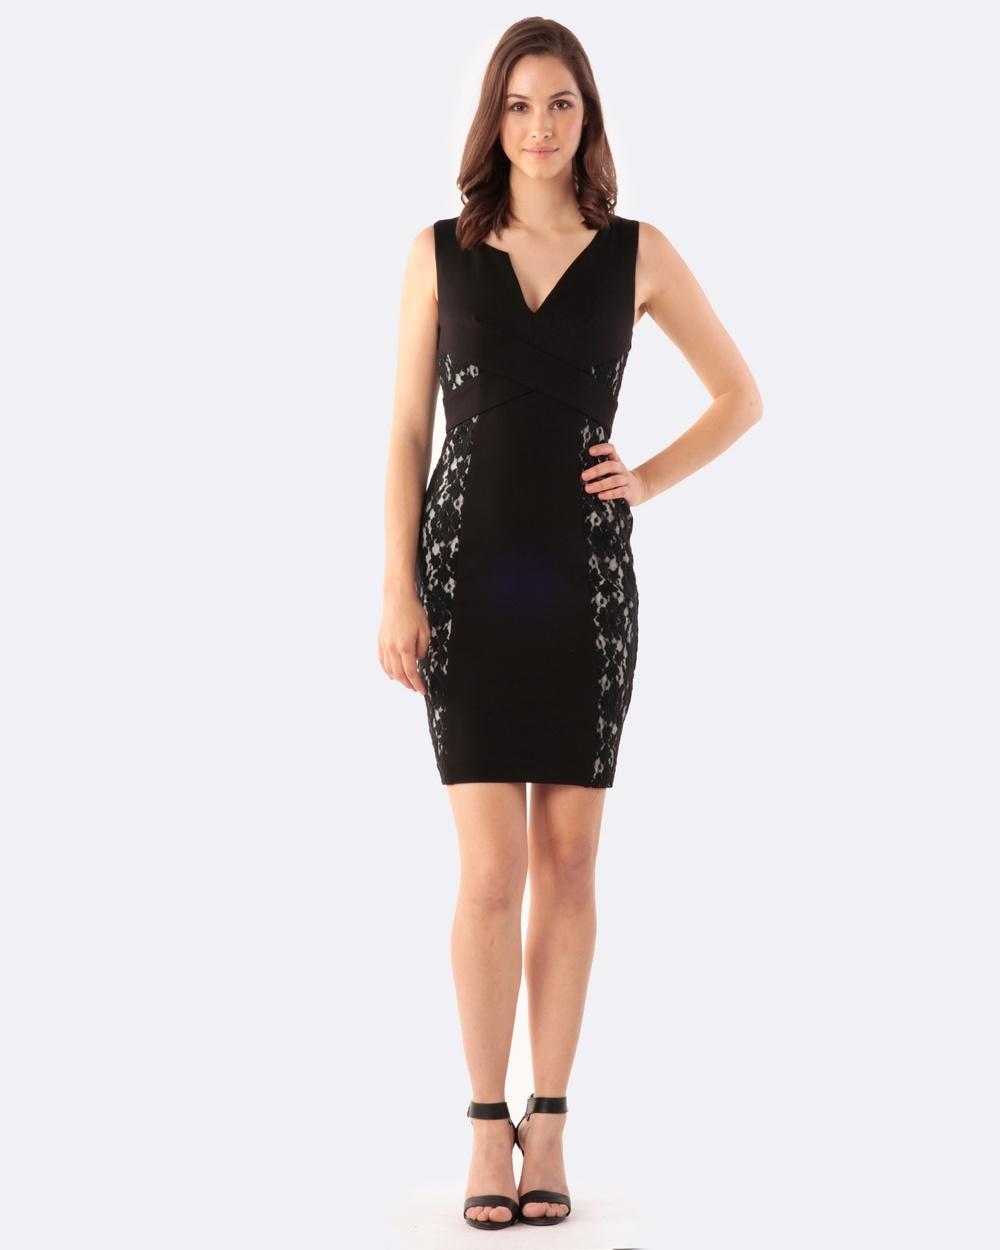 Amelius Cross Front Dress Dresses Black Cross Front Dress